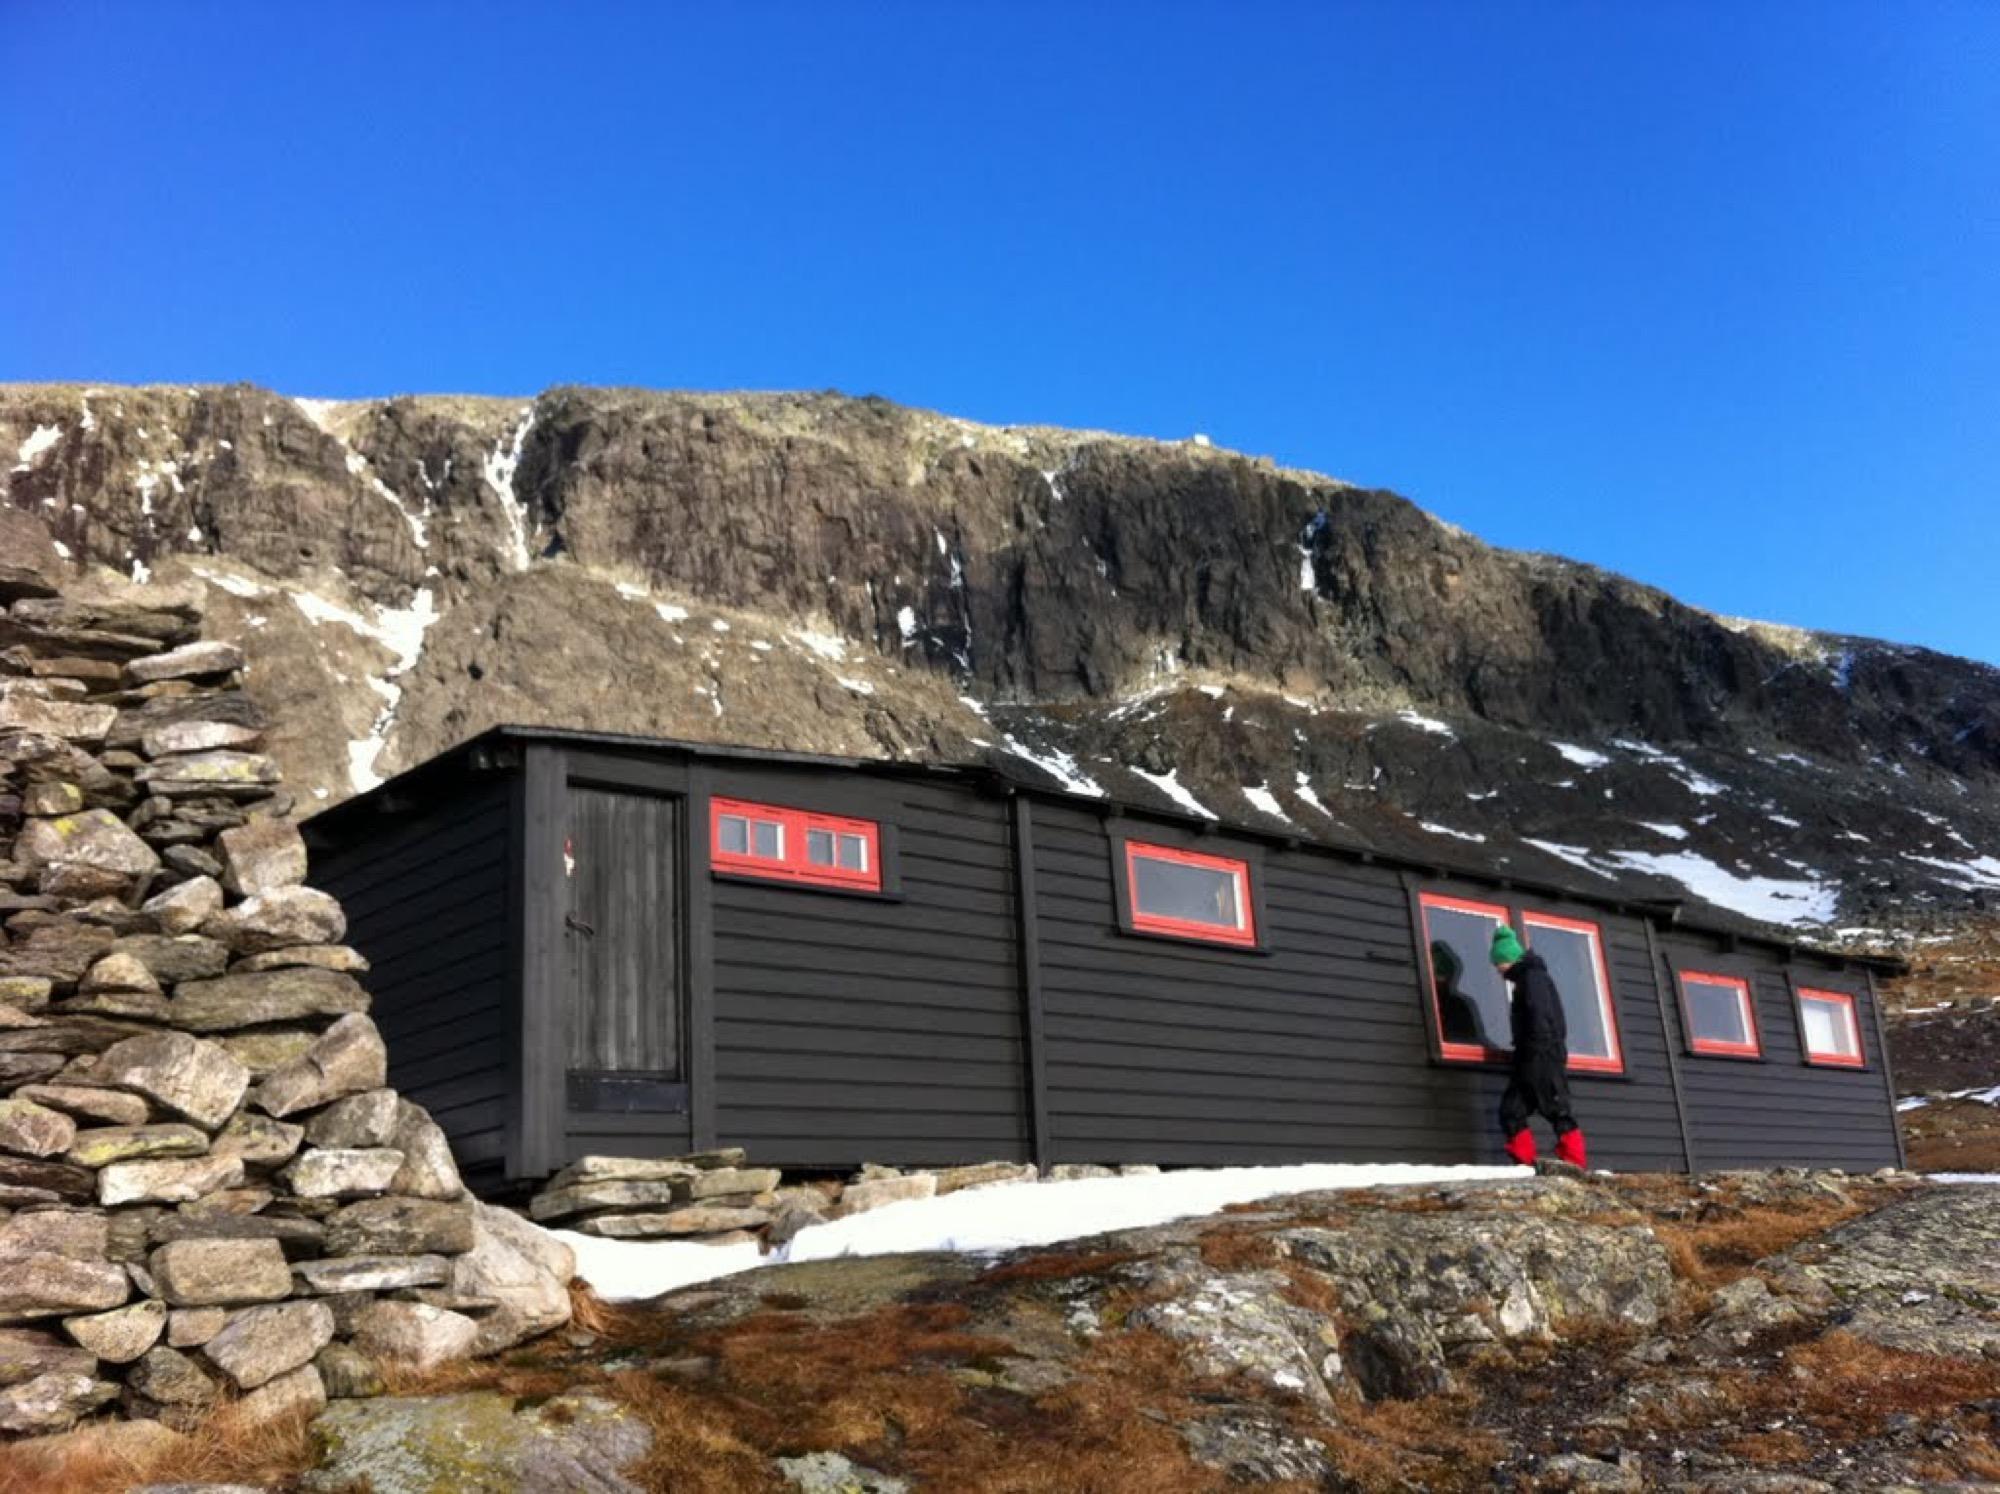 Tvergastein Hut / Photo by Håkon Os Bjerkås